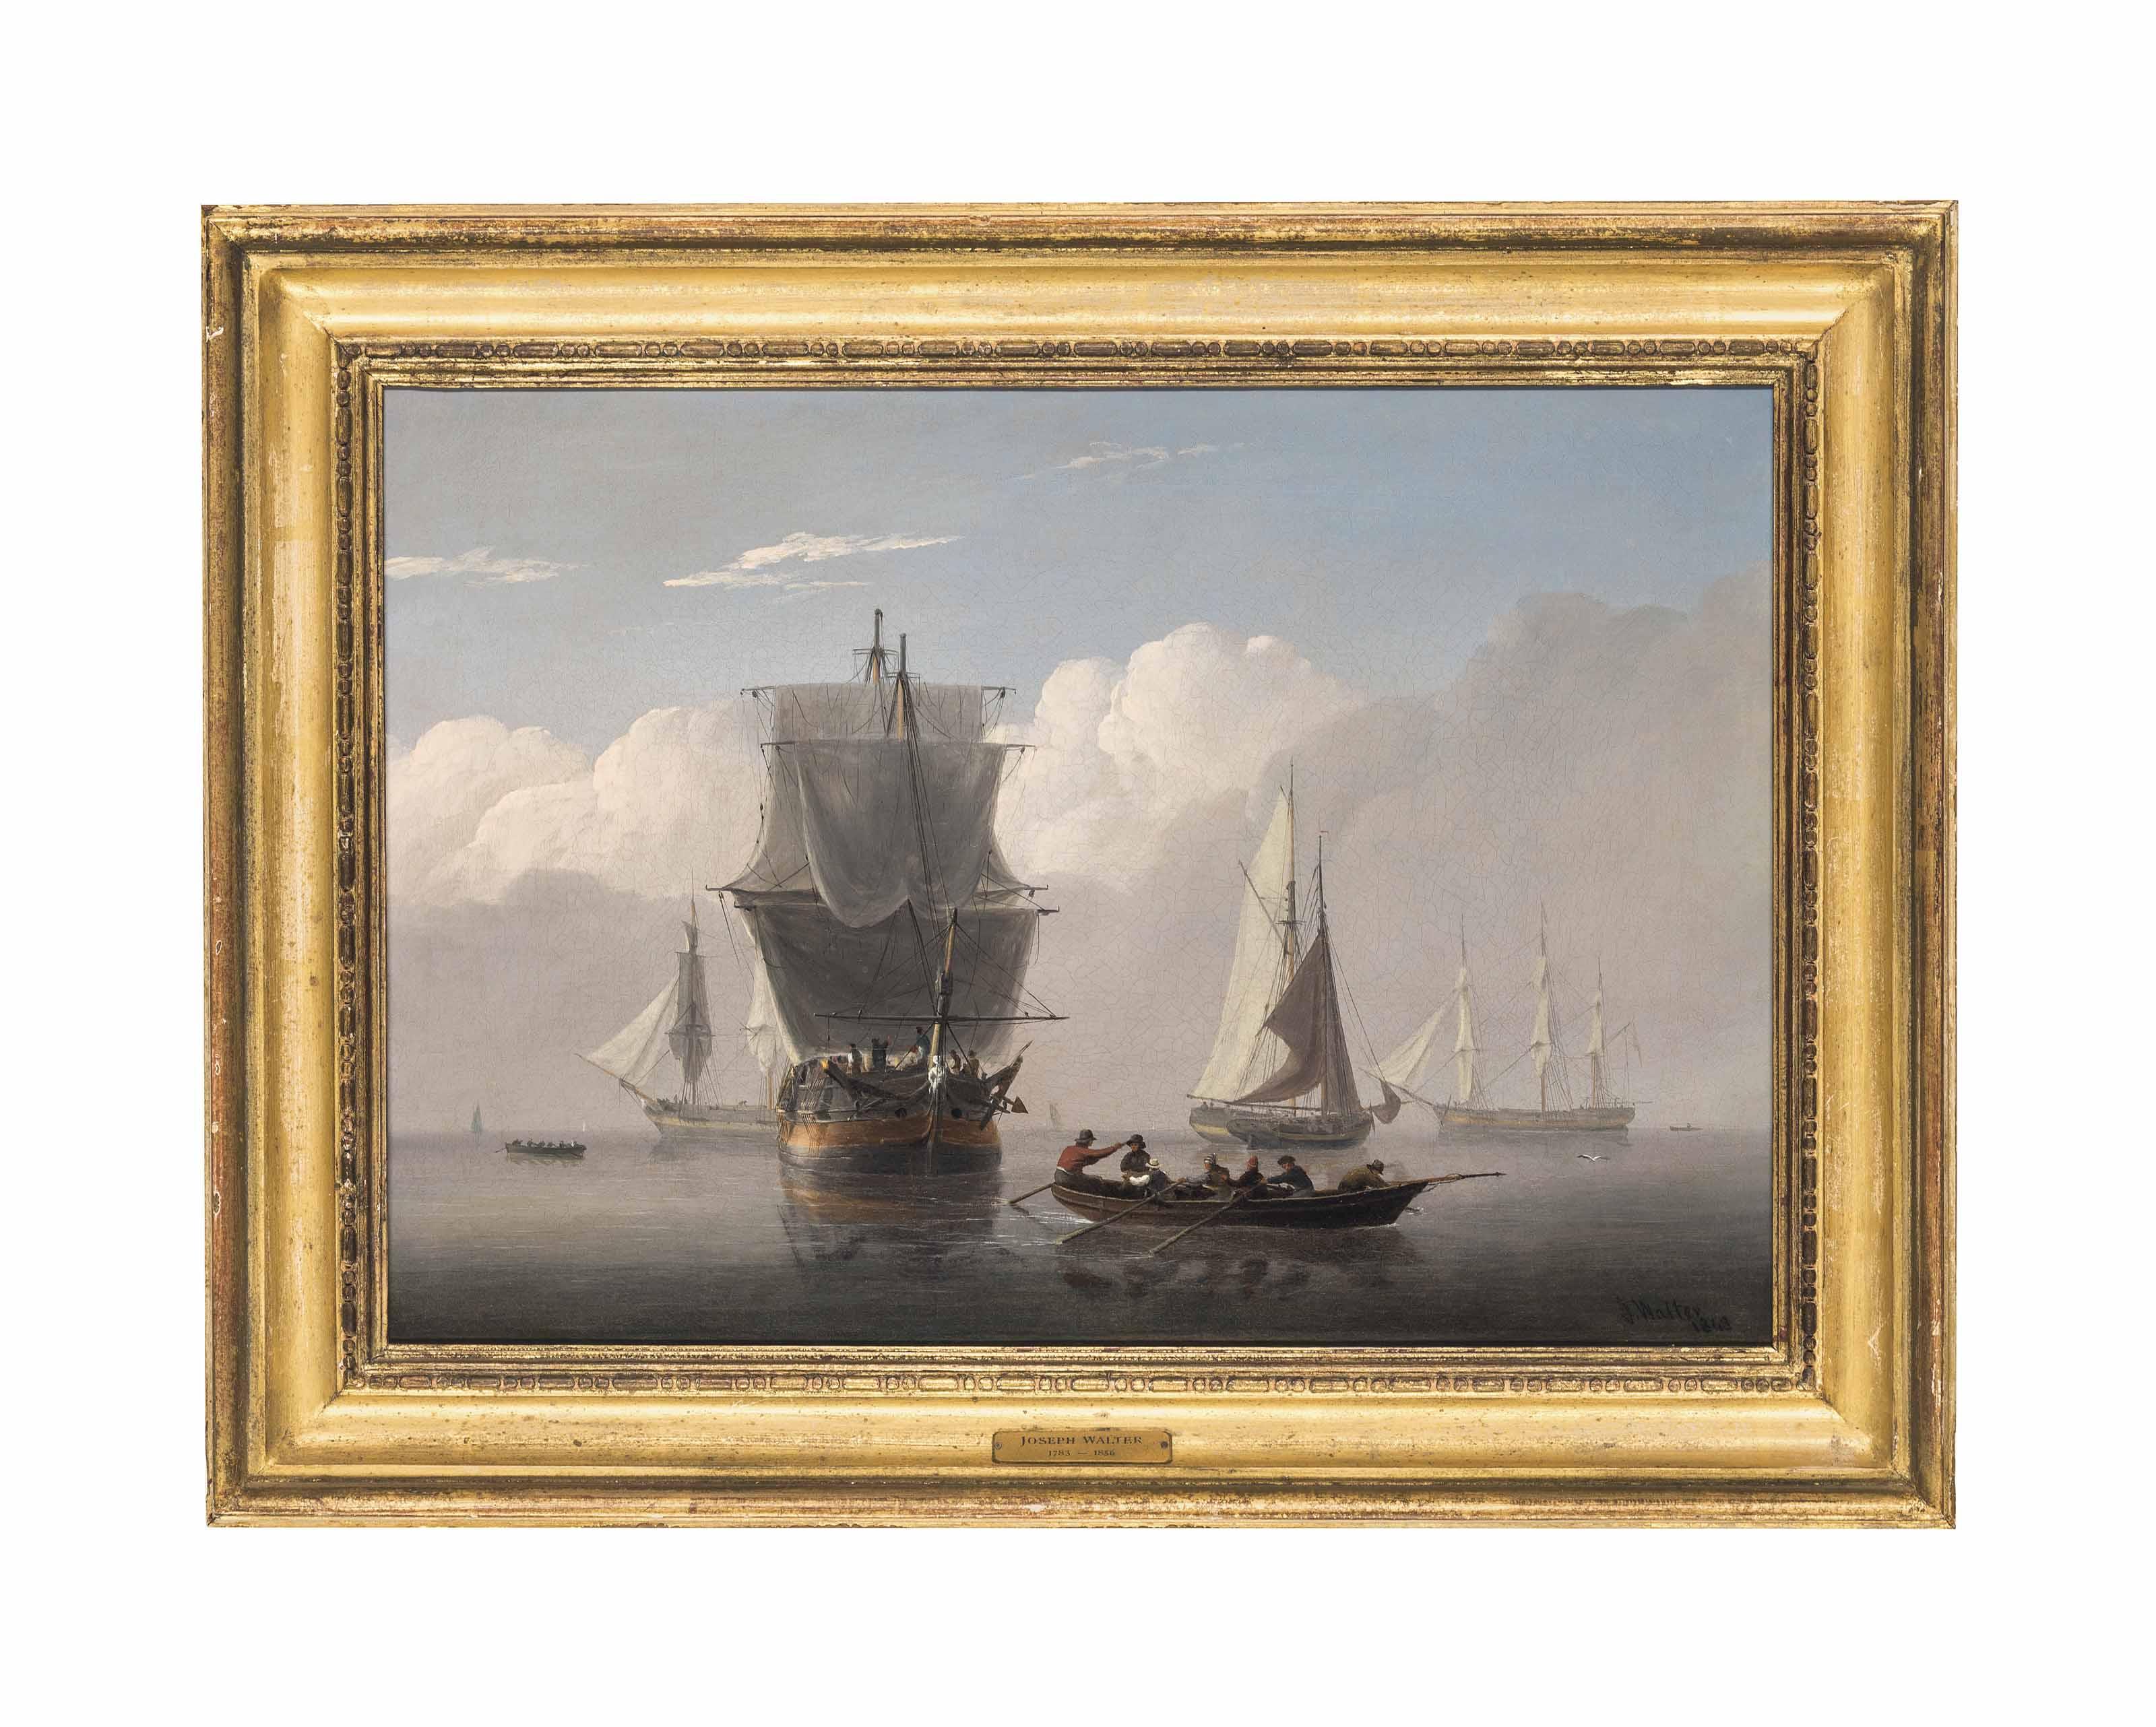 Merchantmen and fishing vessels becalmed